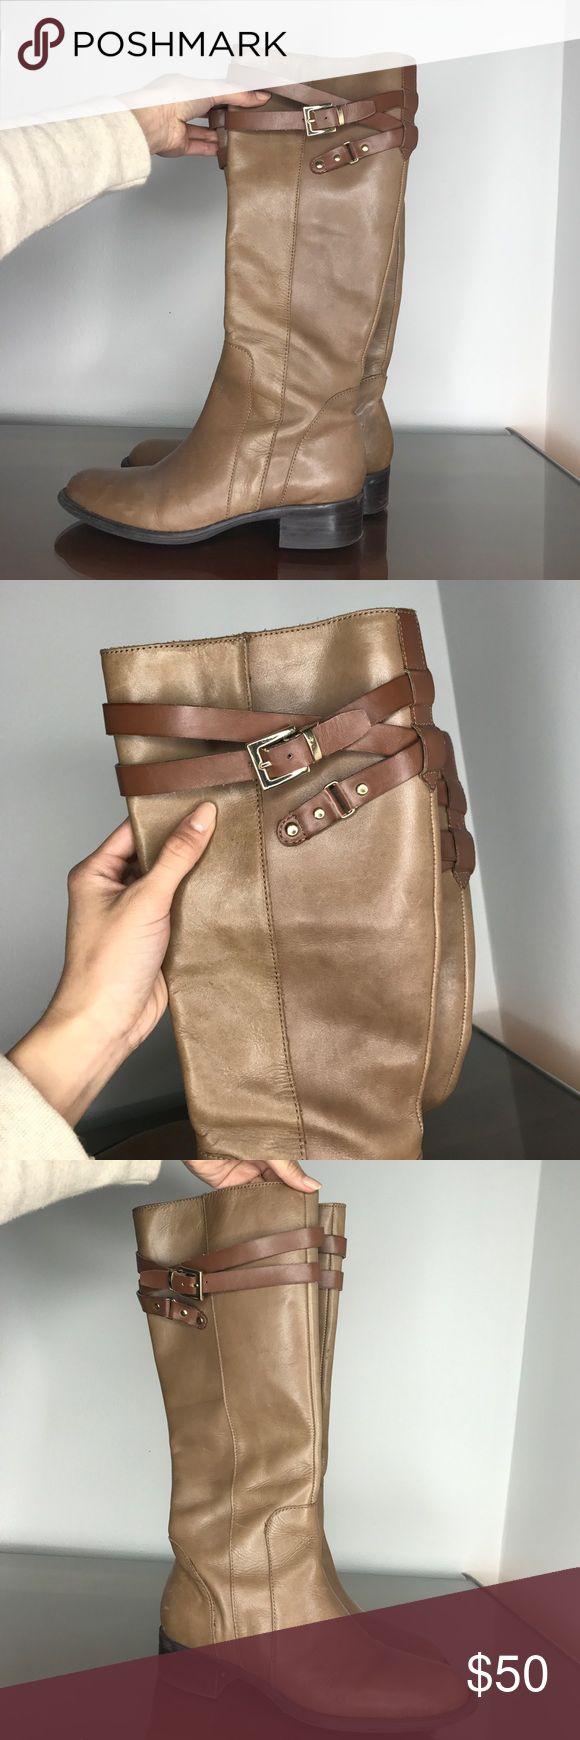 Selling this Tan riding boots on Poshmark! My username is: cwdesign. #shopmycloset #poshmark #fashion #shopping #style #forsale #Franco Sarto #Shoes